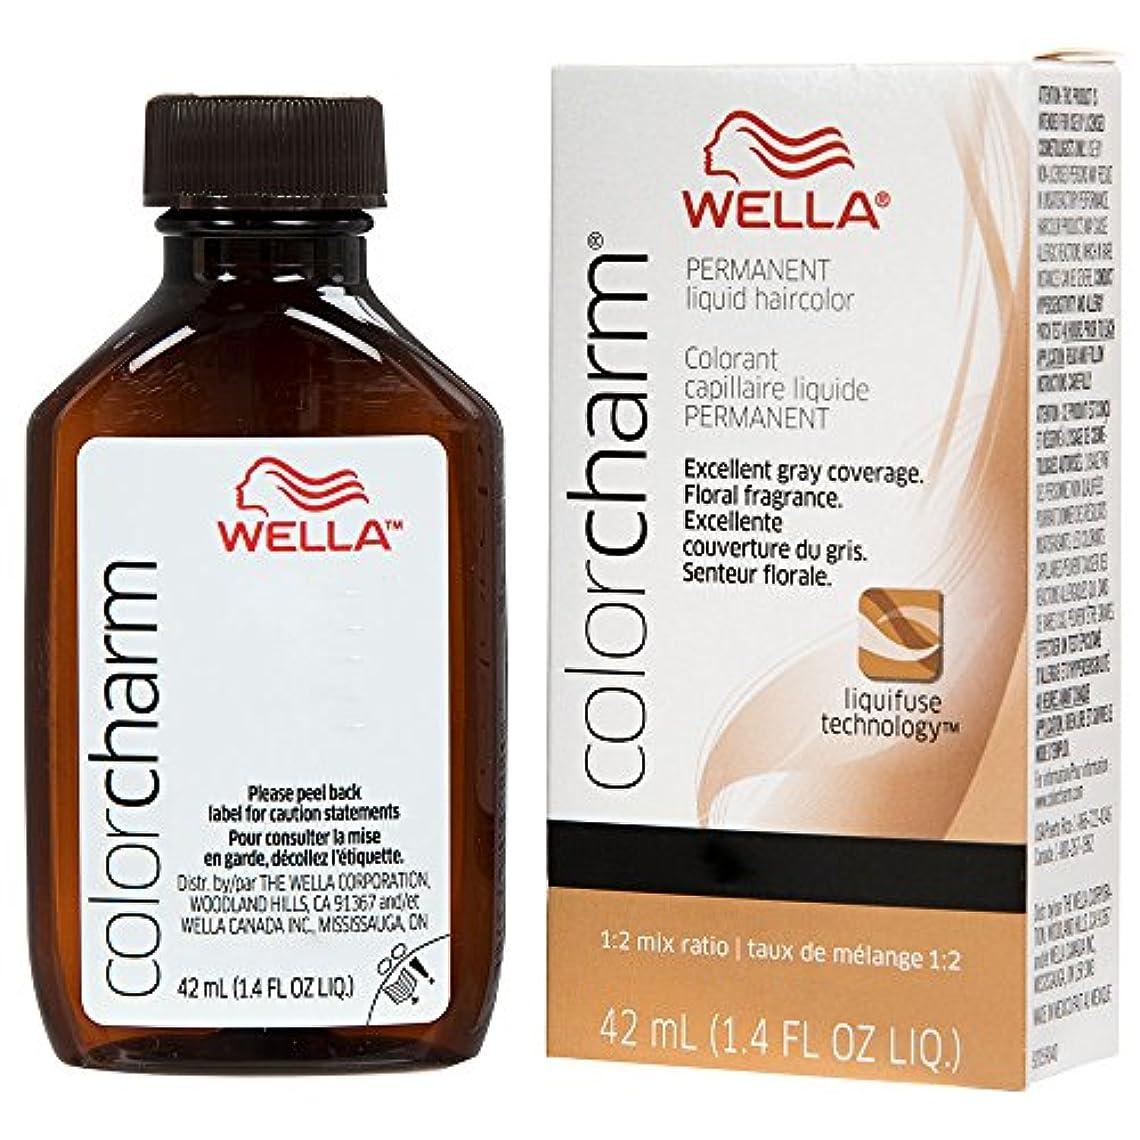 Wella チャーム液体ヘアカラー、1200 / 12Nブロンド超ペール 1.4オンス #1200 / 12Nブロンド超ペール